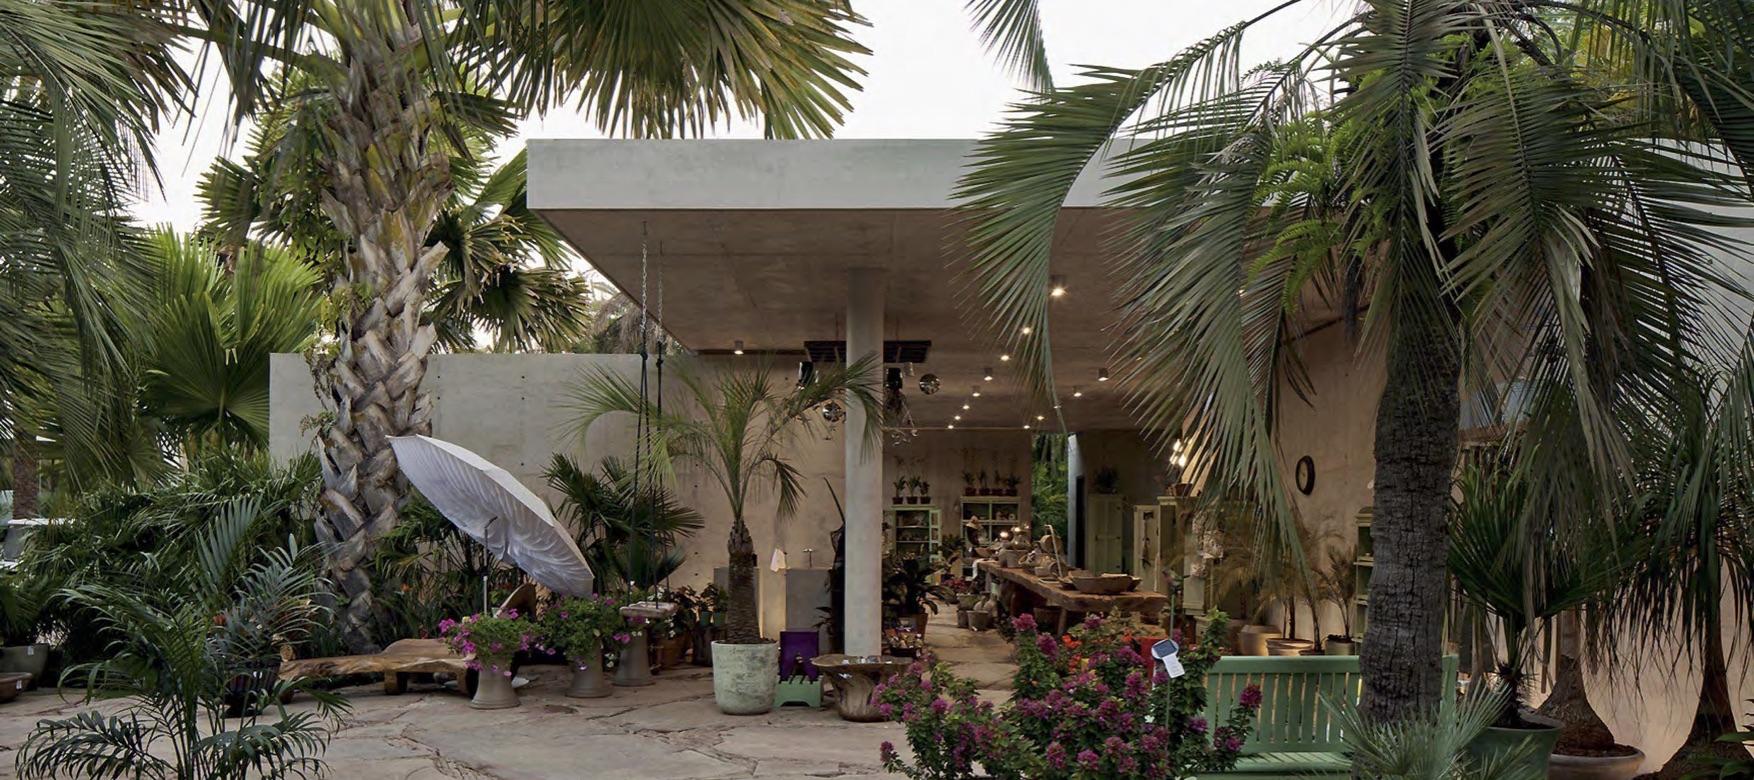 Loga Botanica by Rizoma Arquitetura at the Inhotim Institute